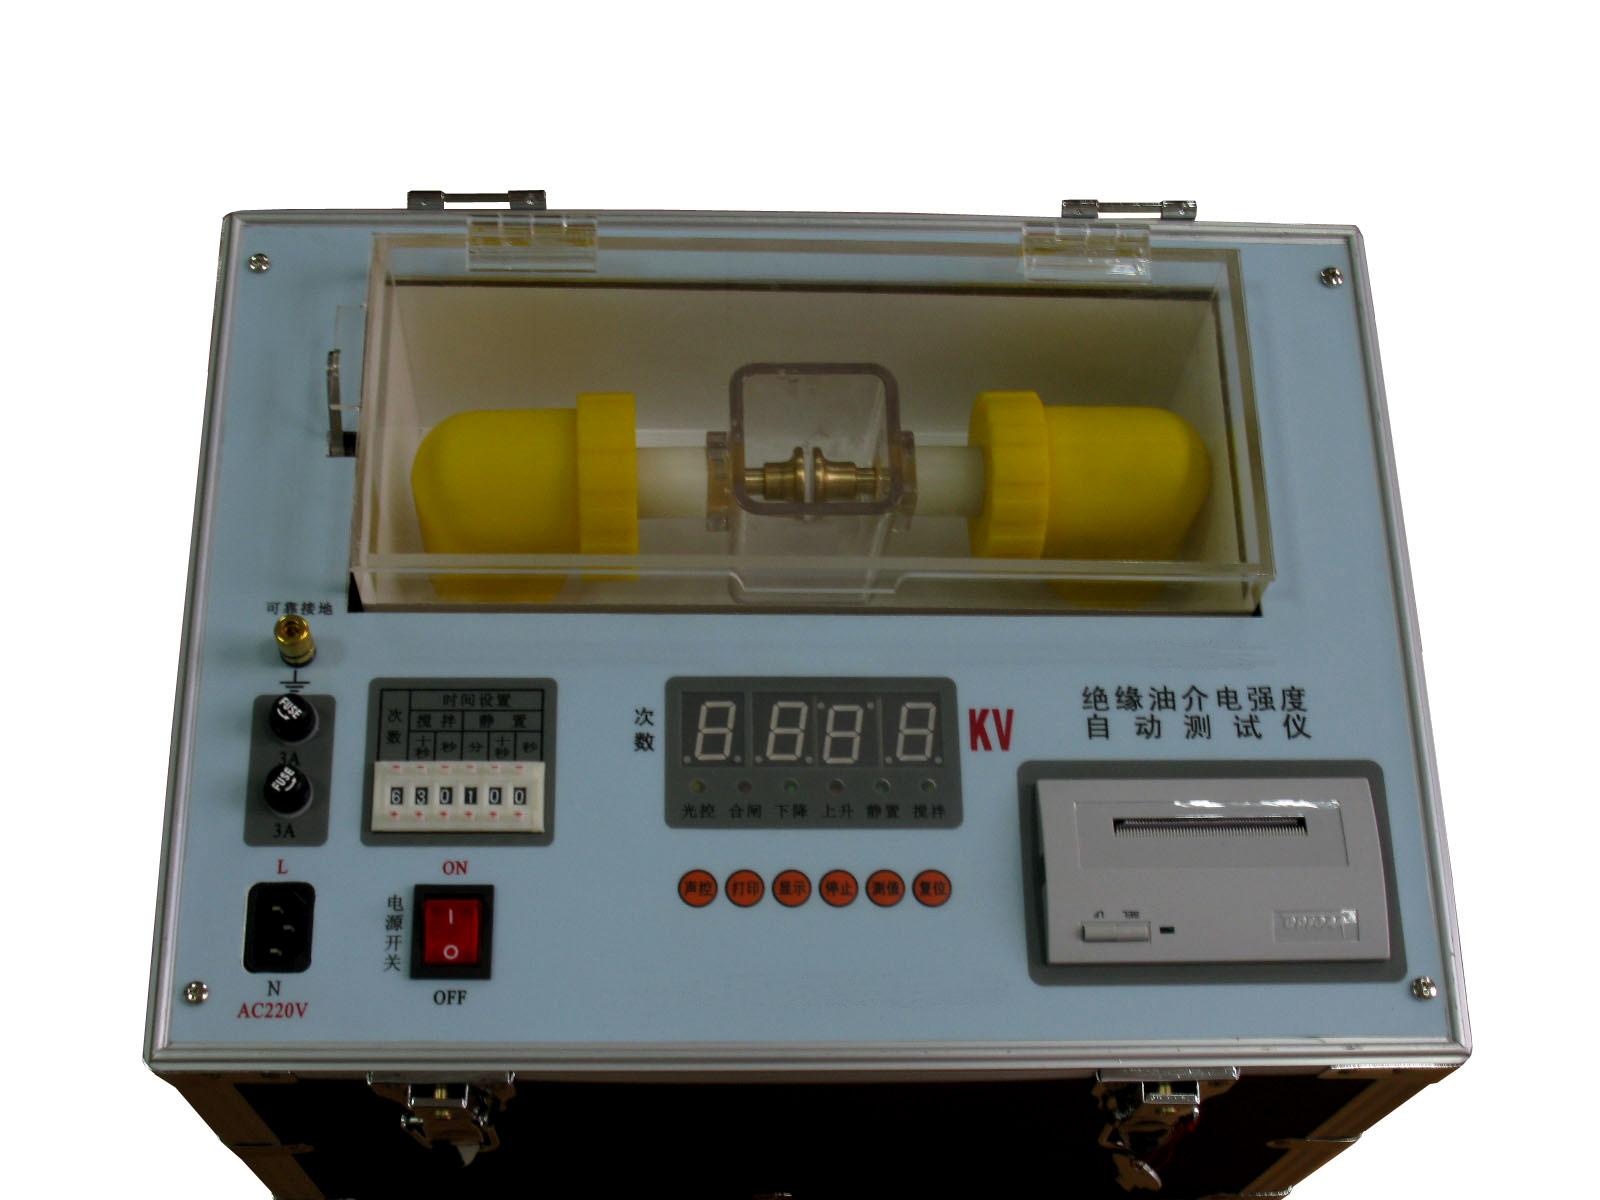 Aceite de transformador de aceite aislante probador de rigidez dieléctrica